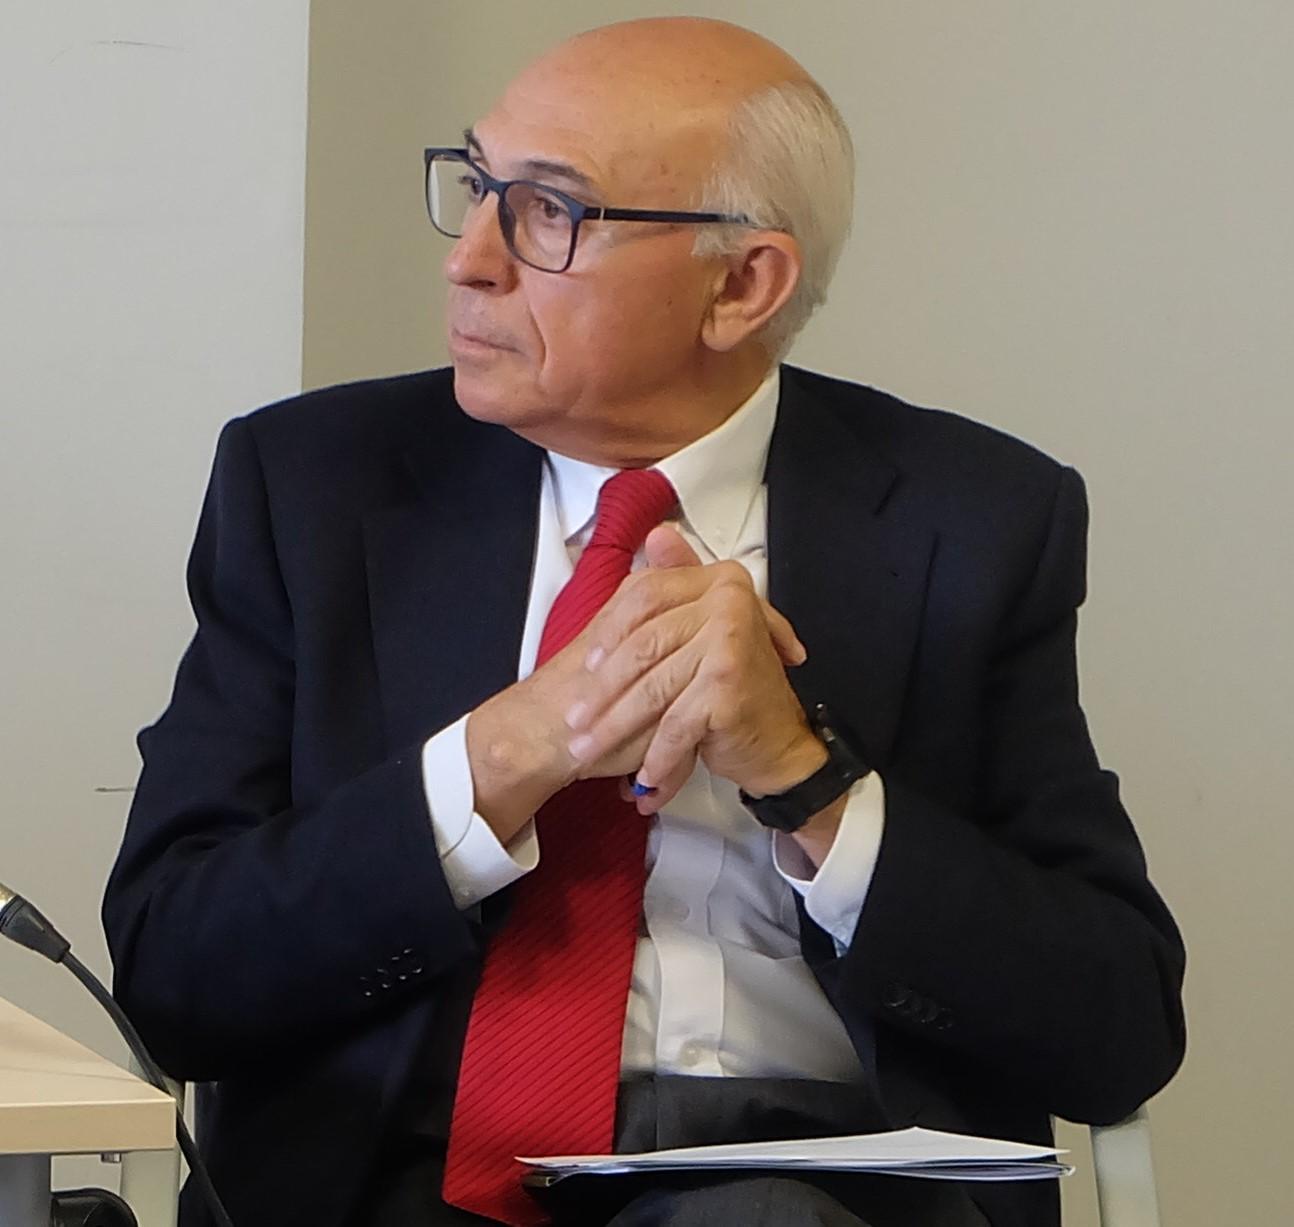 Juan Pérez. Presidente de Cermi CyL